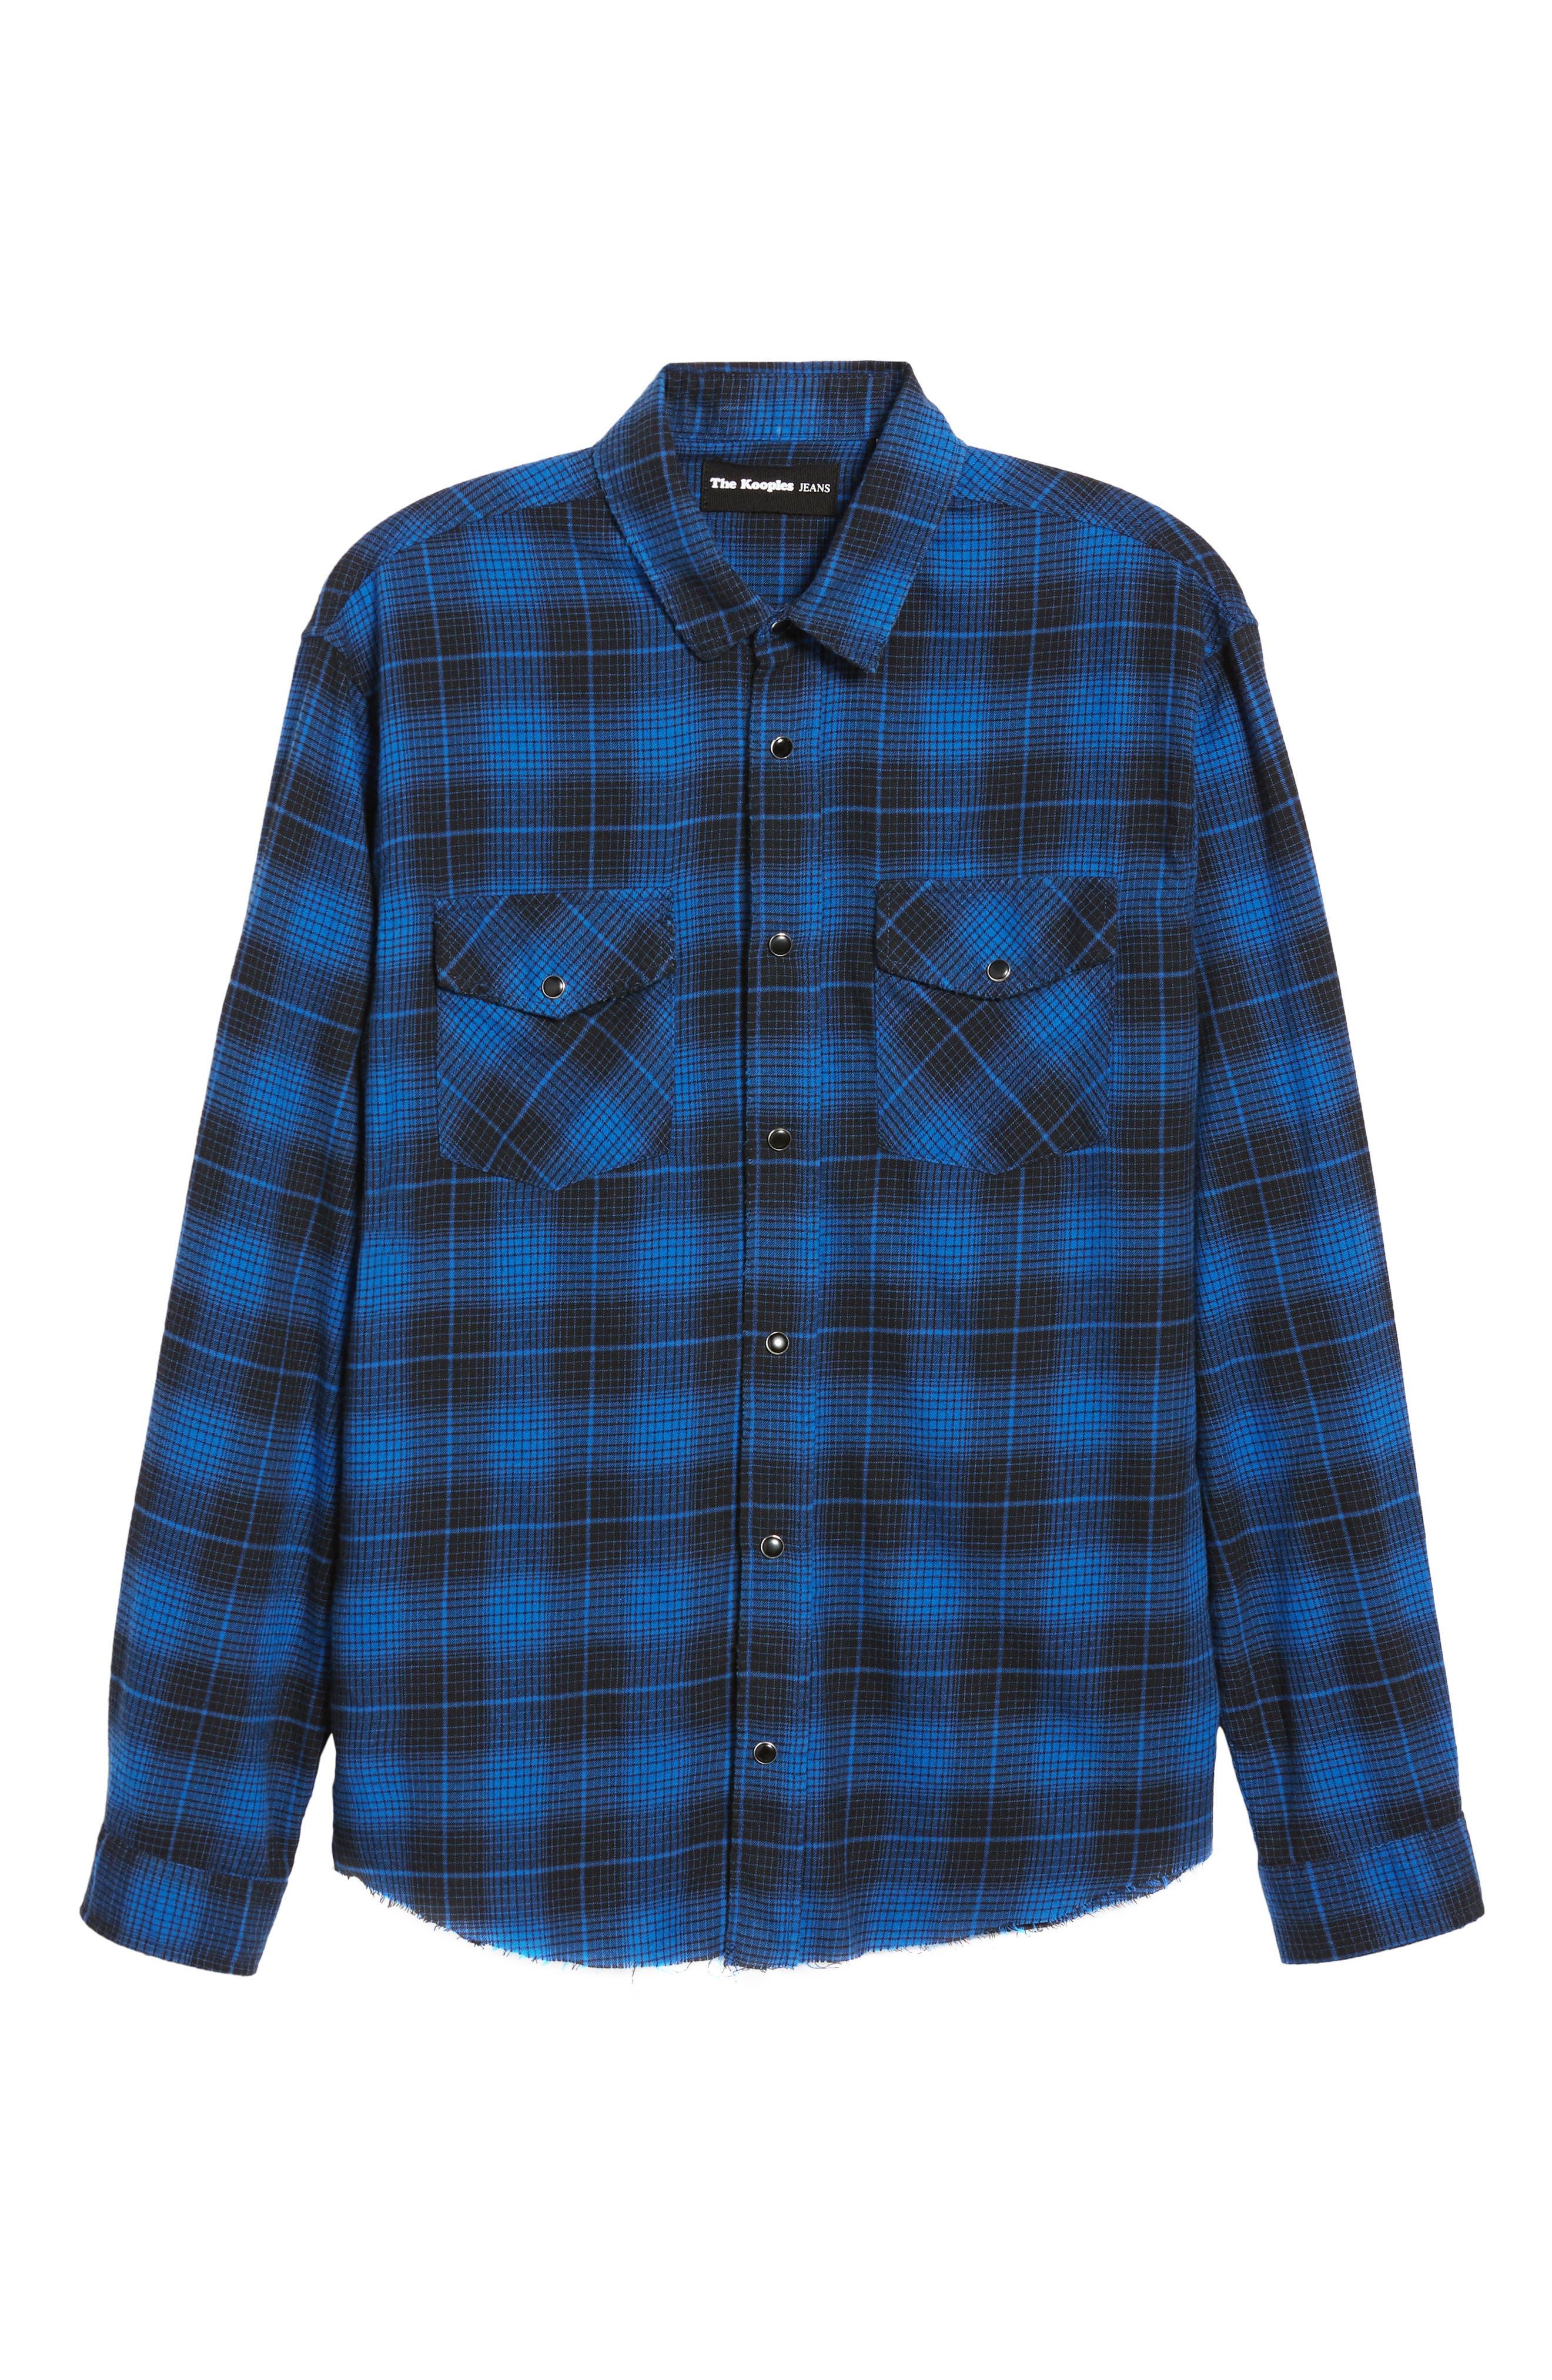 THE KOOPLES, Plaid Flannel Shirt, Alternate thumbnail 5, color, 400